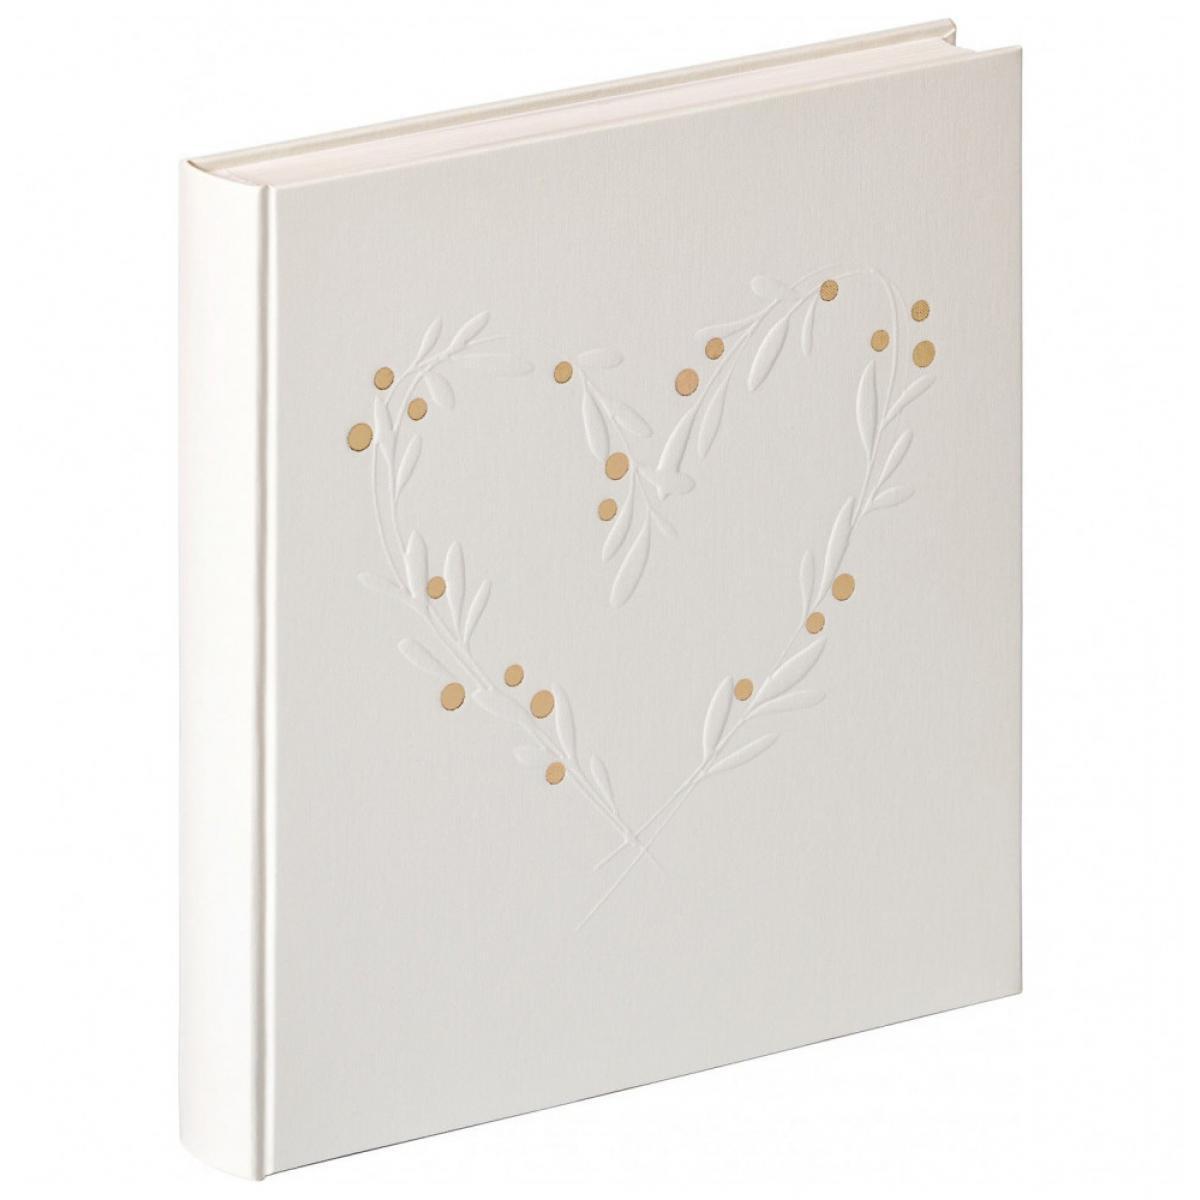 Ac-Deco Album photo de mariage Sentimental - 30,5 x 28 cm - Blanc